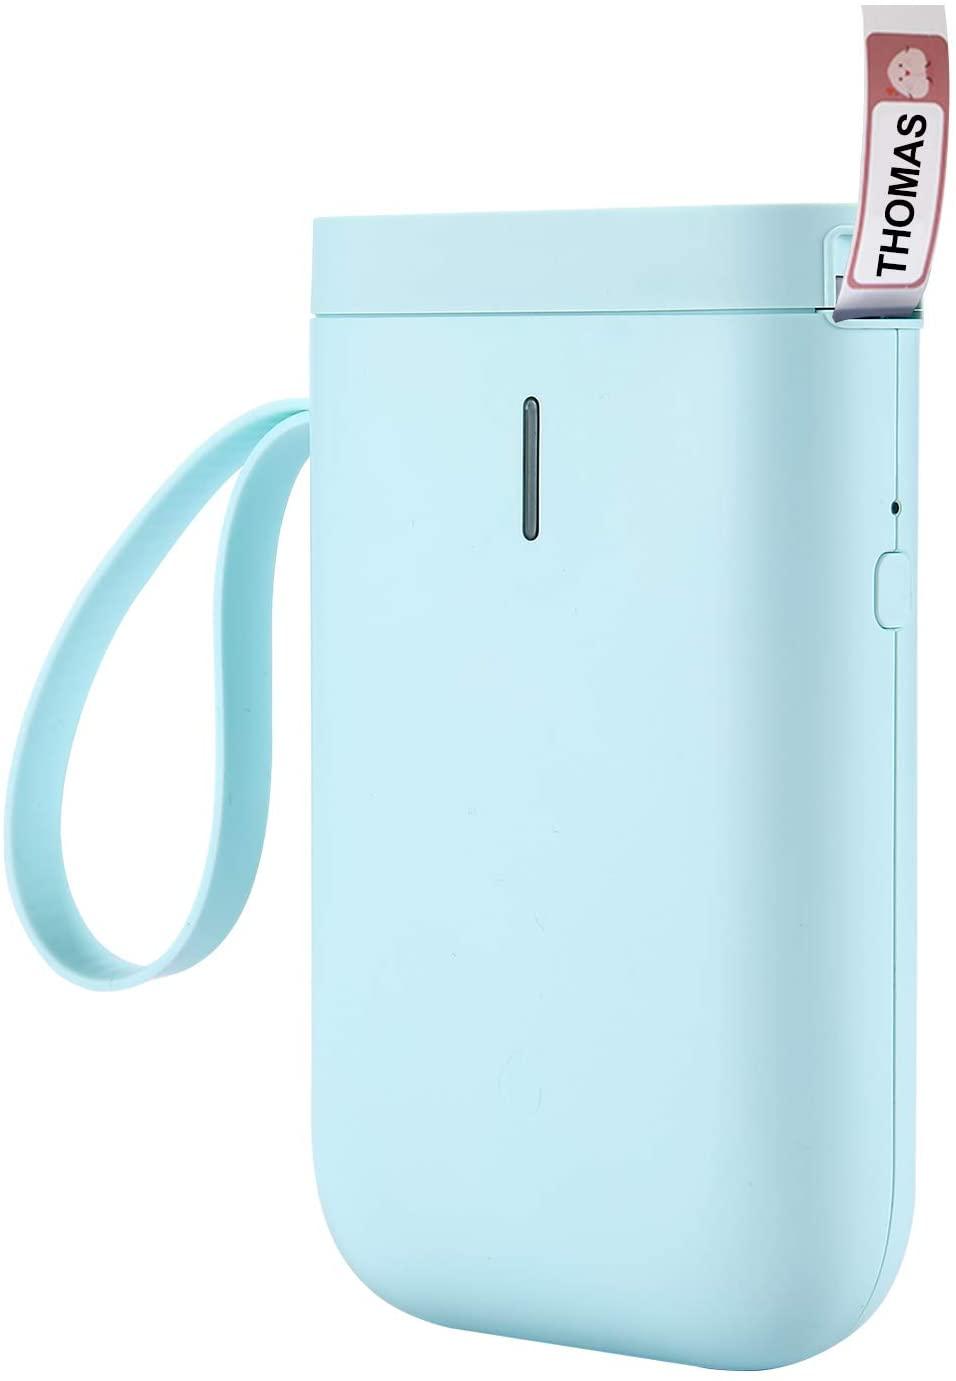 Impresora térmica portátil de etiquetas